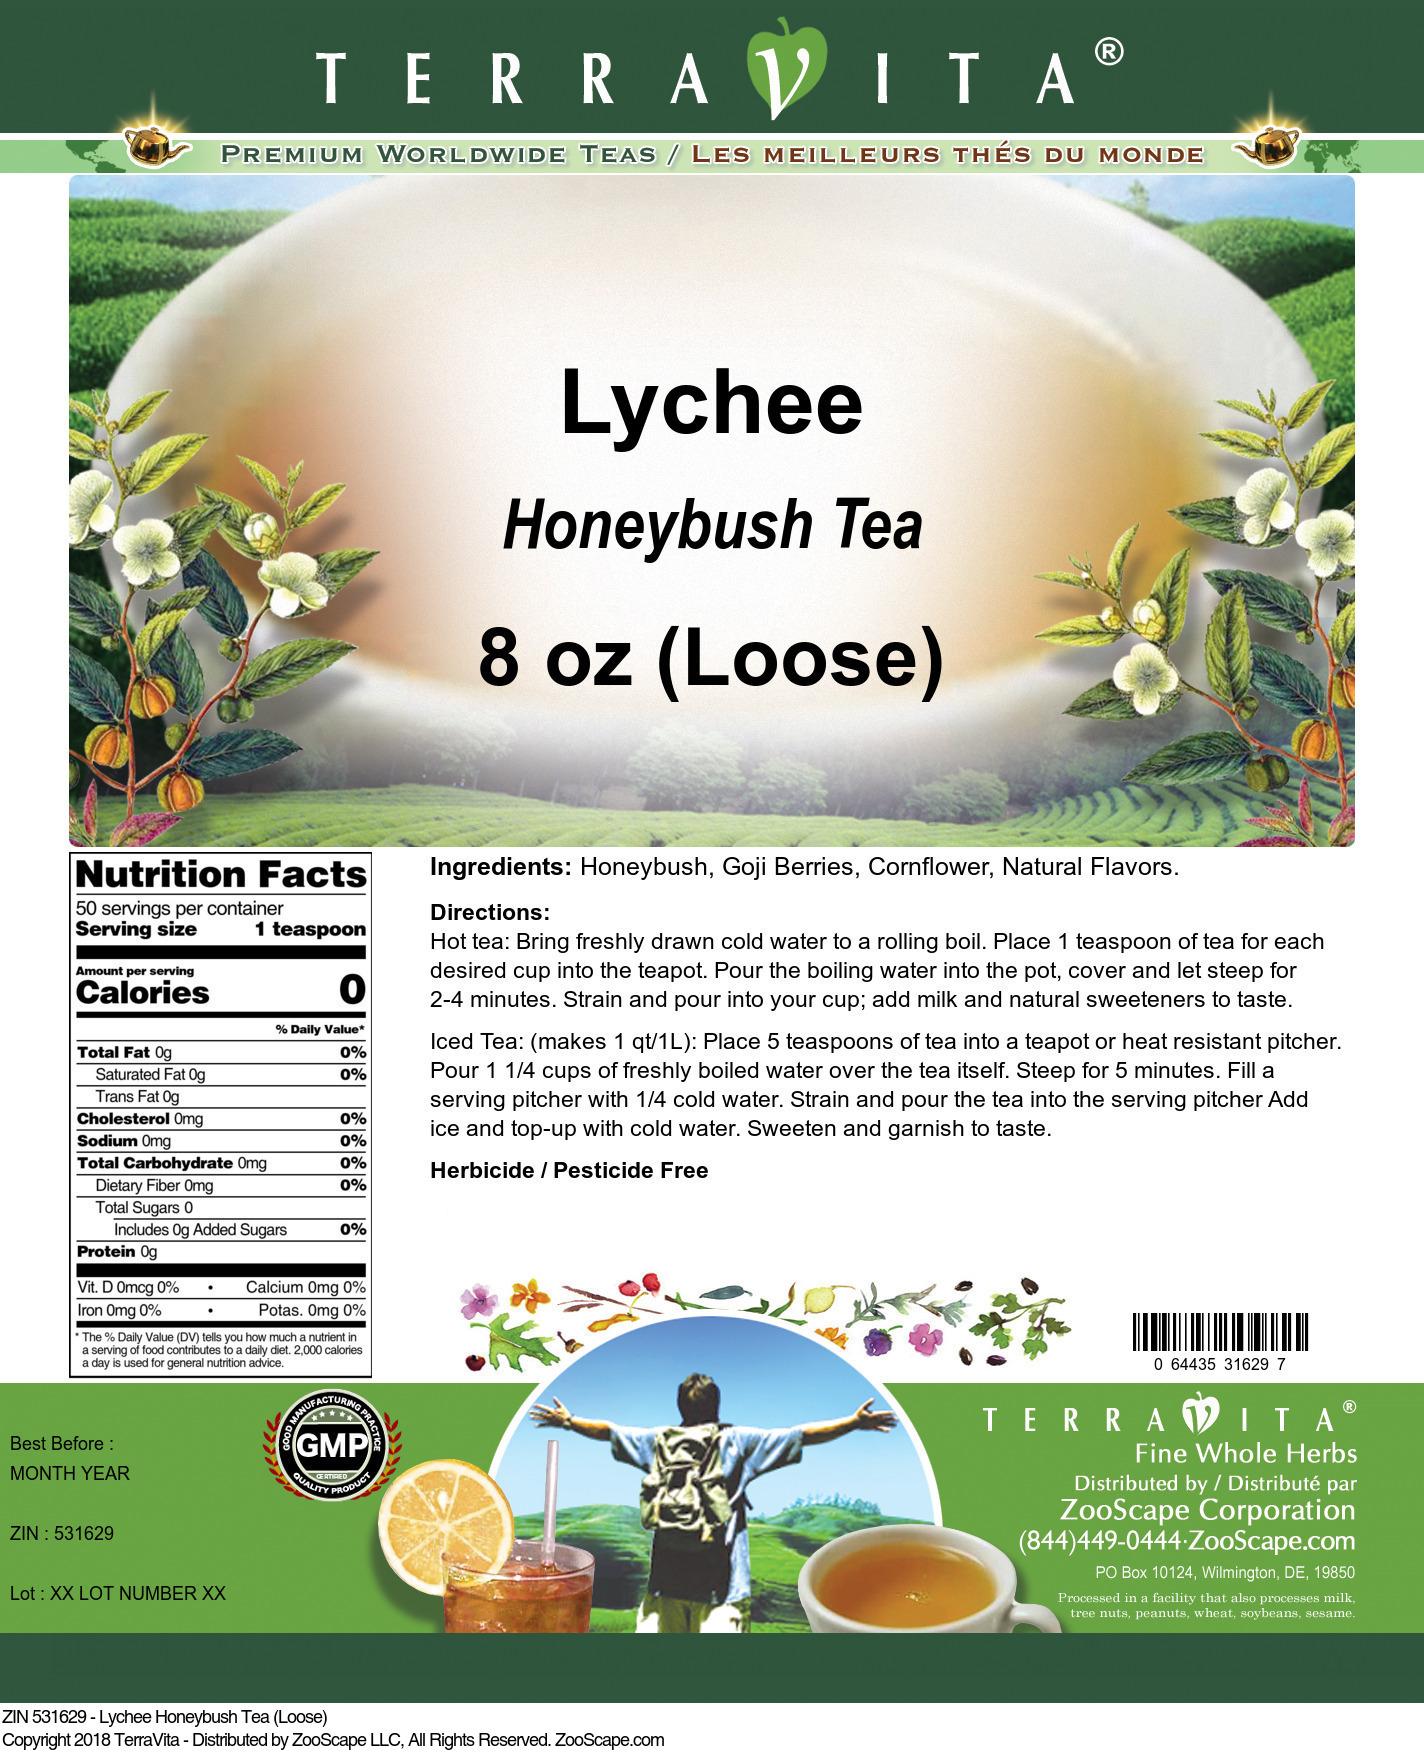 Lychee Honeybush Tea (Loose)